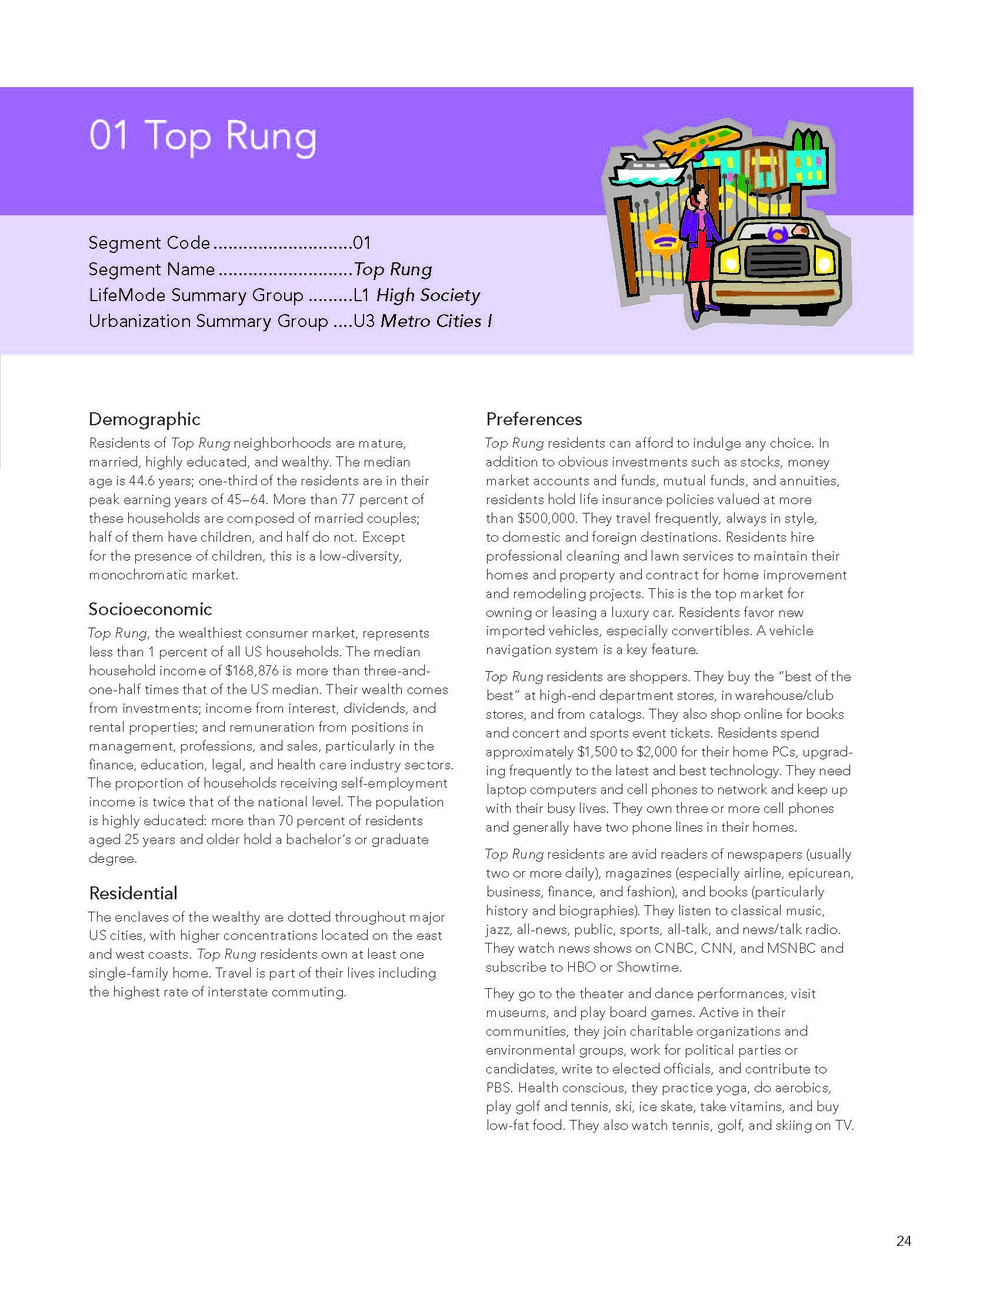 tapestry-segmentation_Page_27.jpg